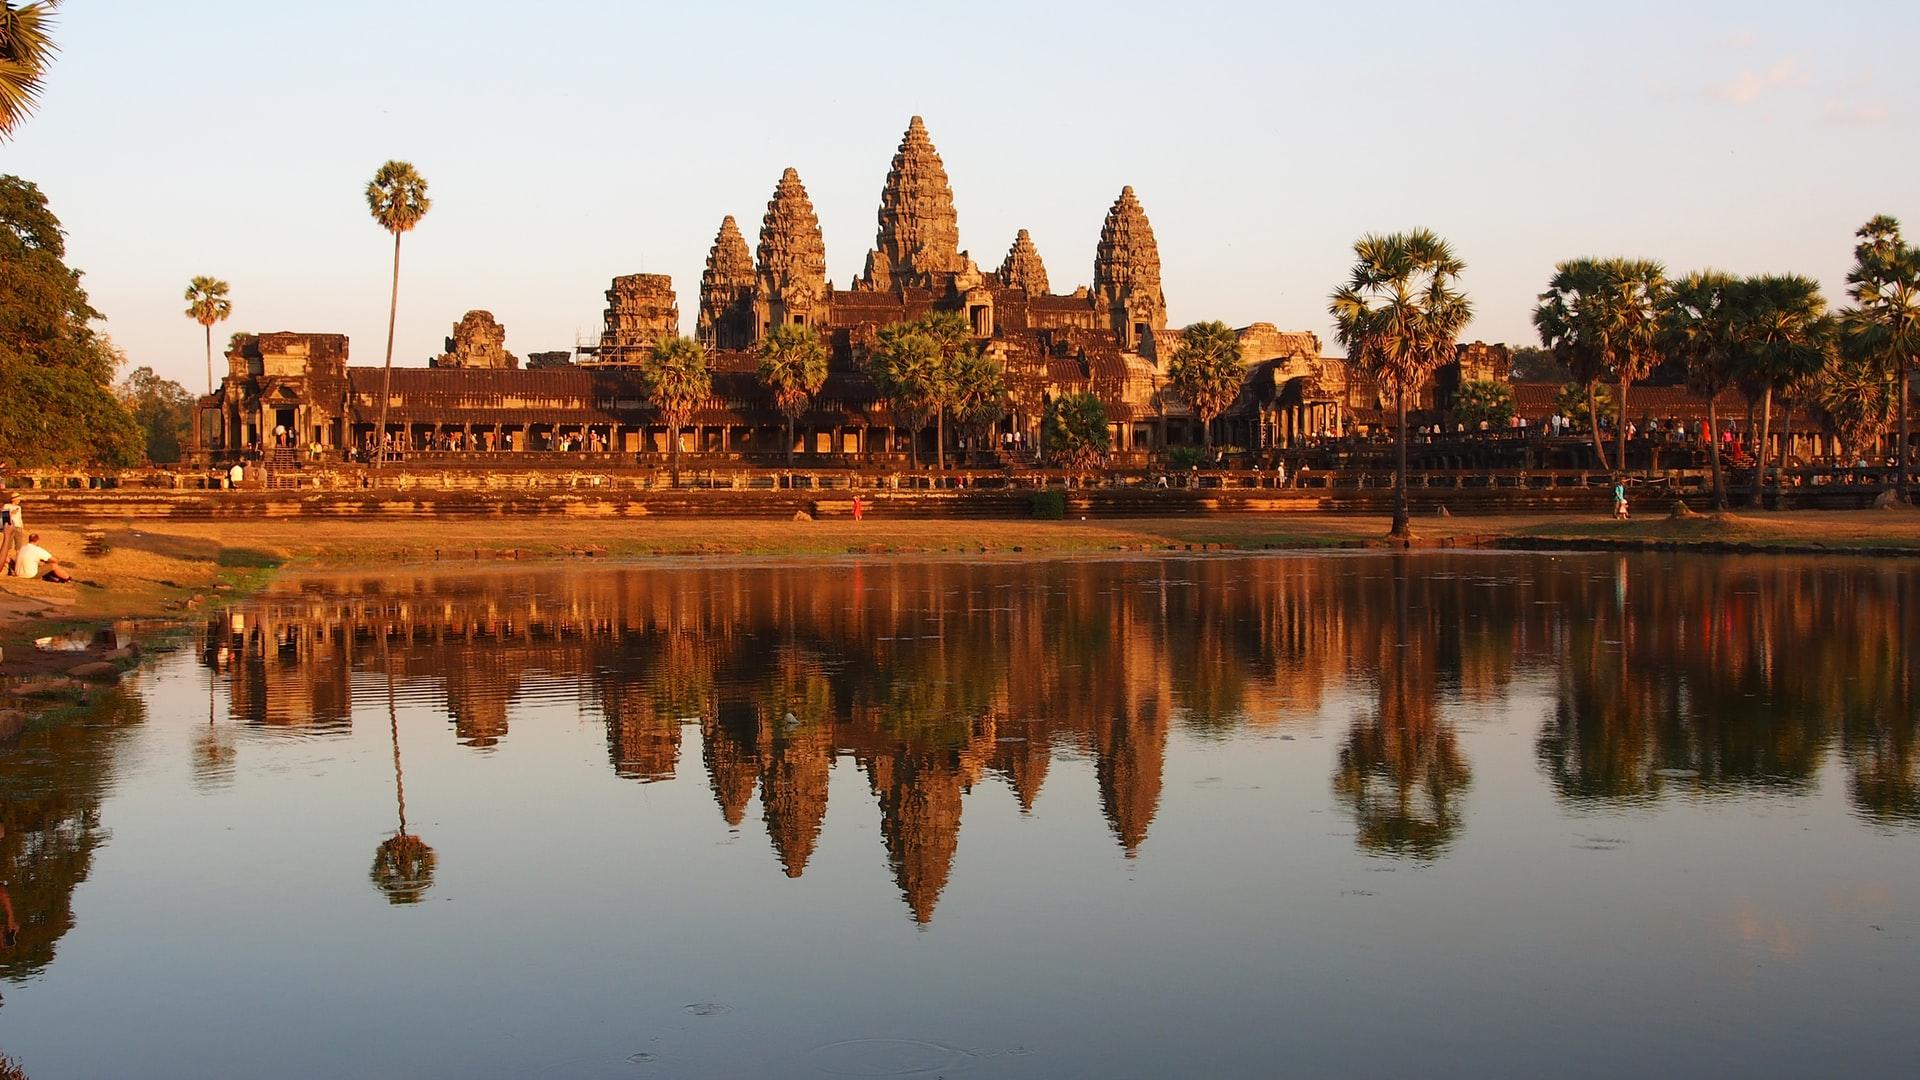 Angkor Wat Sunrise - Angkor Wat Sunset - Angkor Wat Sunrise or Sunset - Angkor Wat after 5pm 2